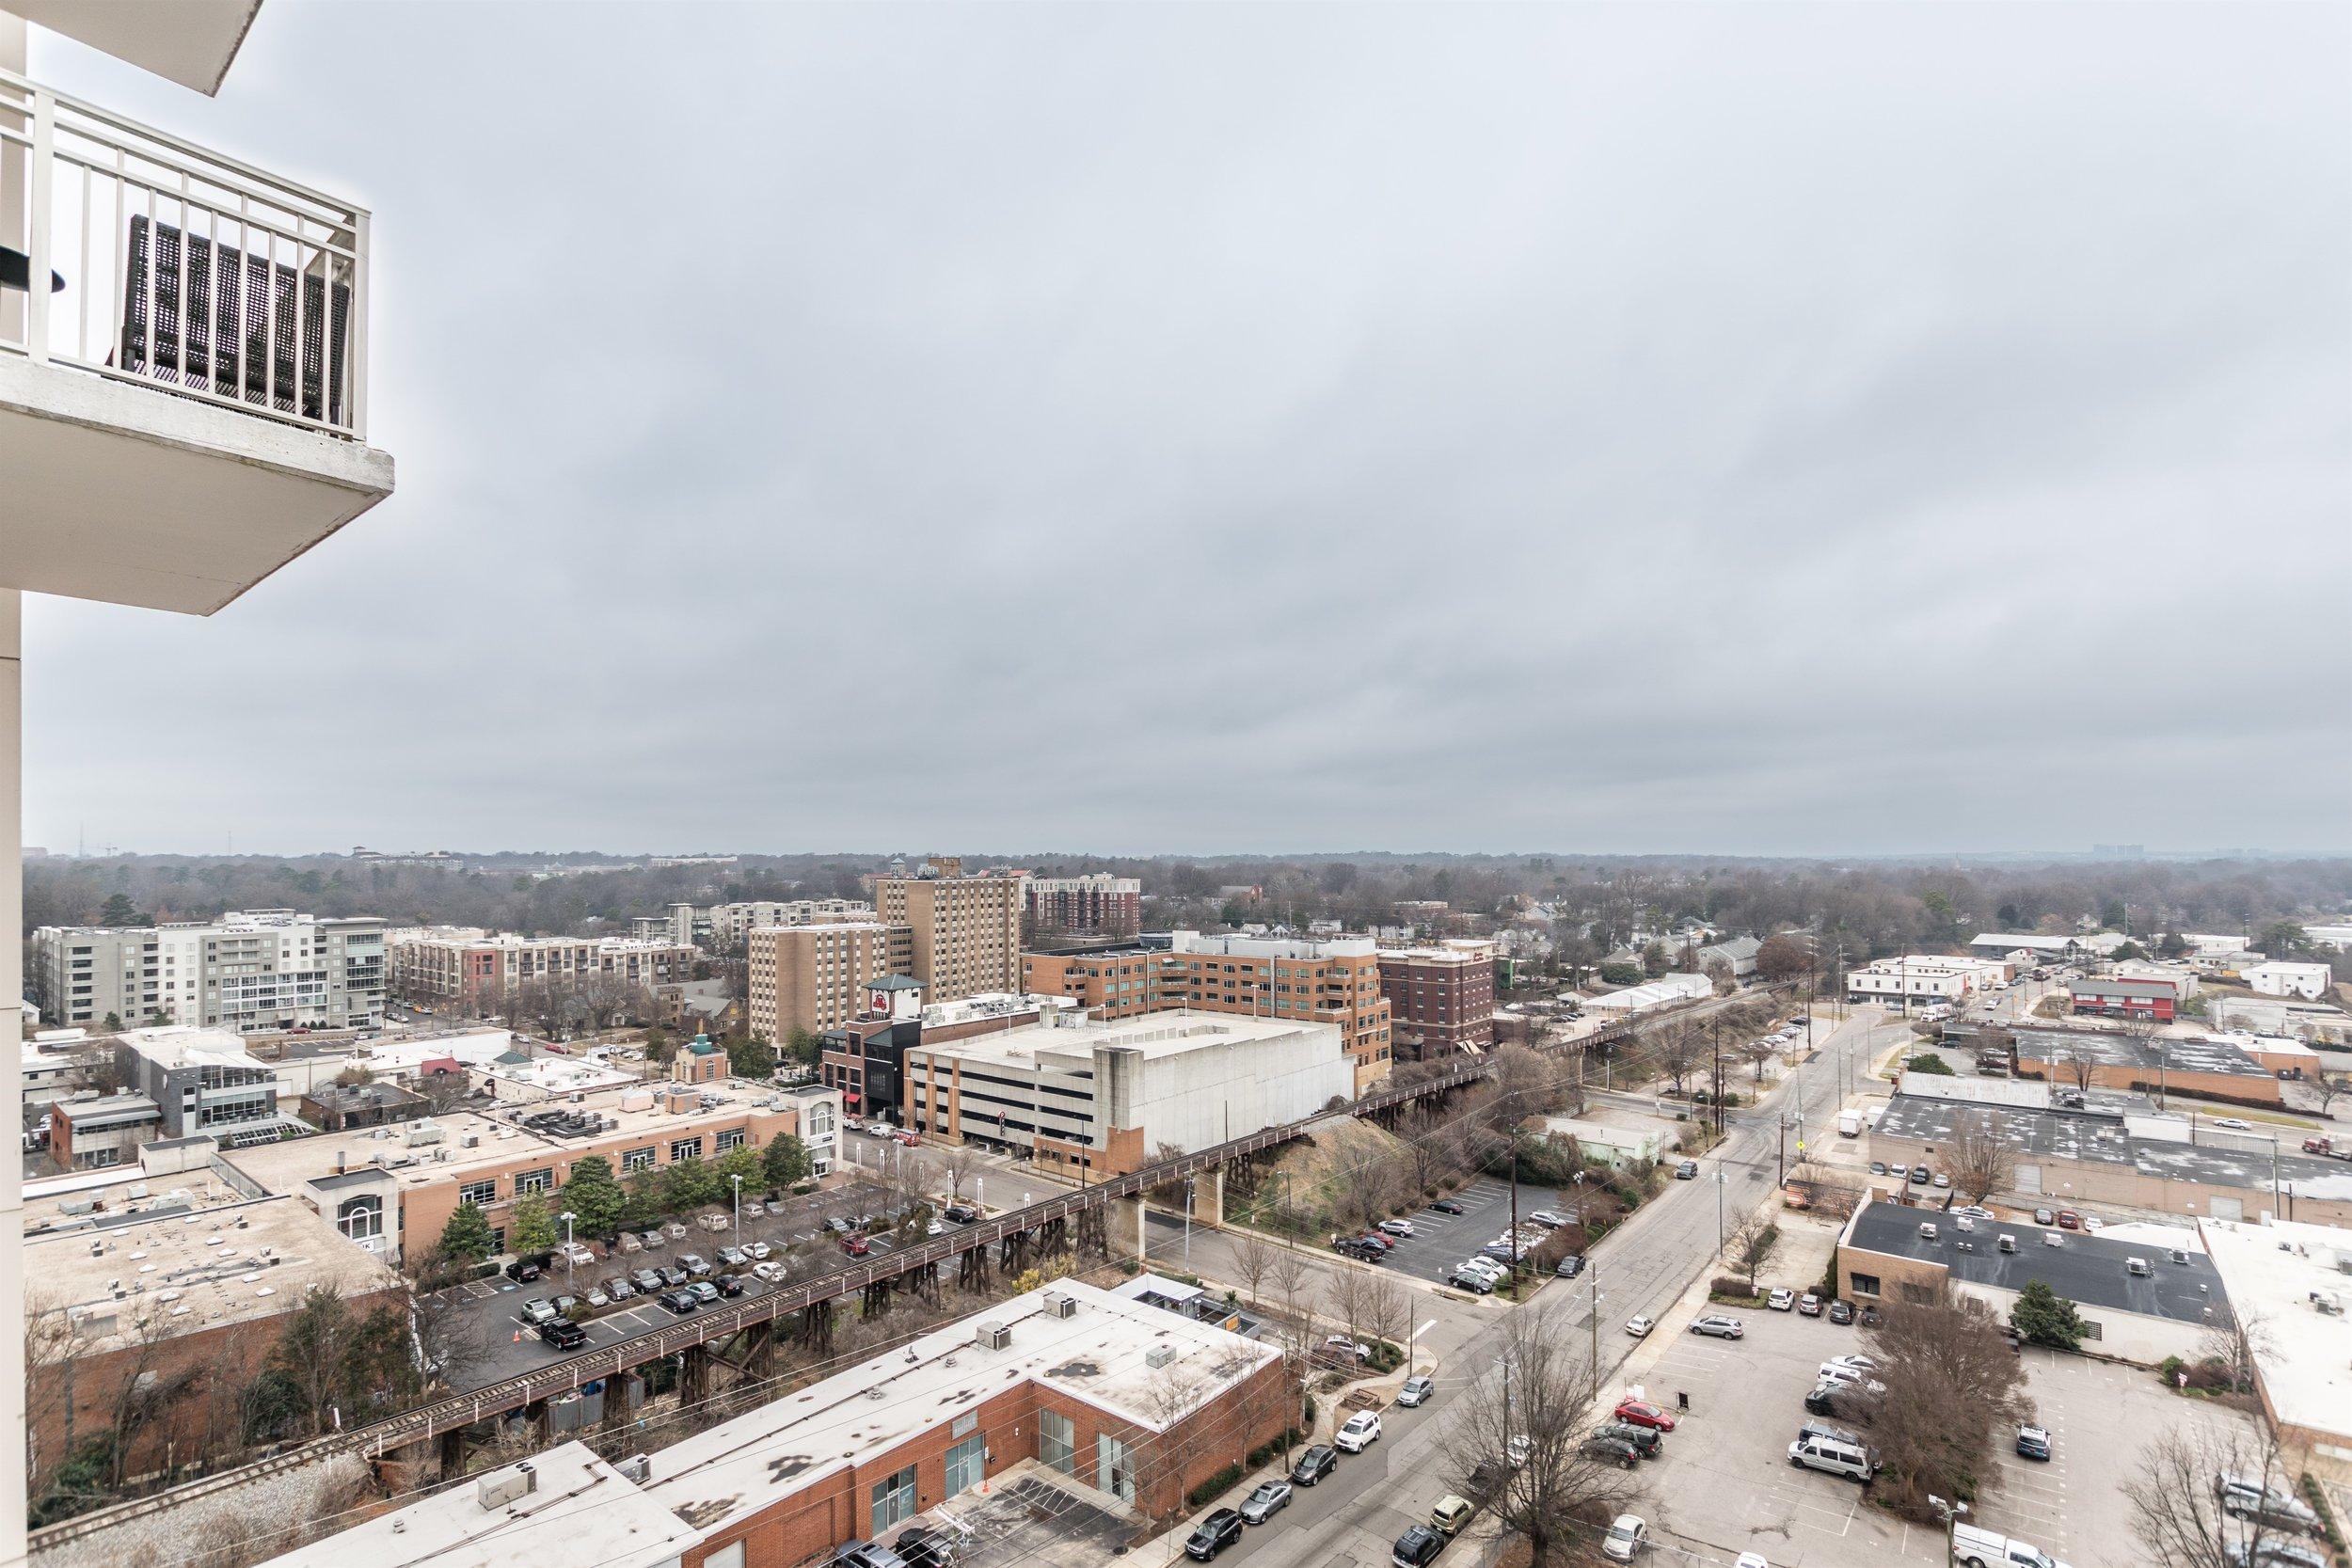 022_Balcony View Of Raleigh.jpg